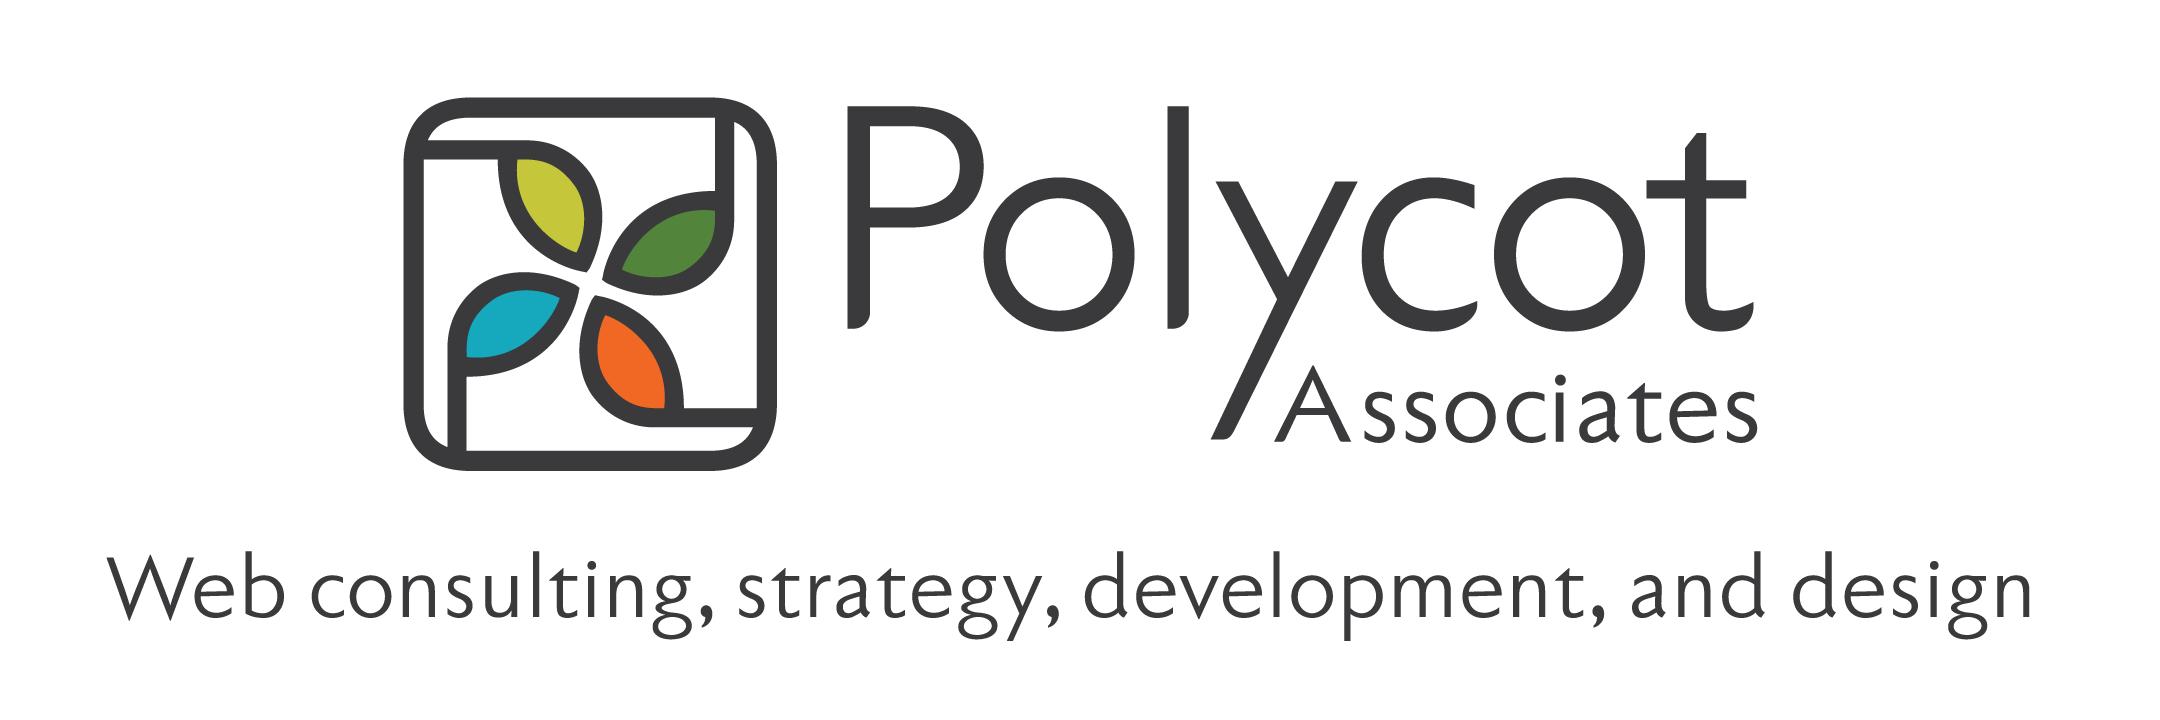 Polycot-logos-2x6-large-01.png